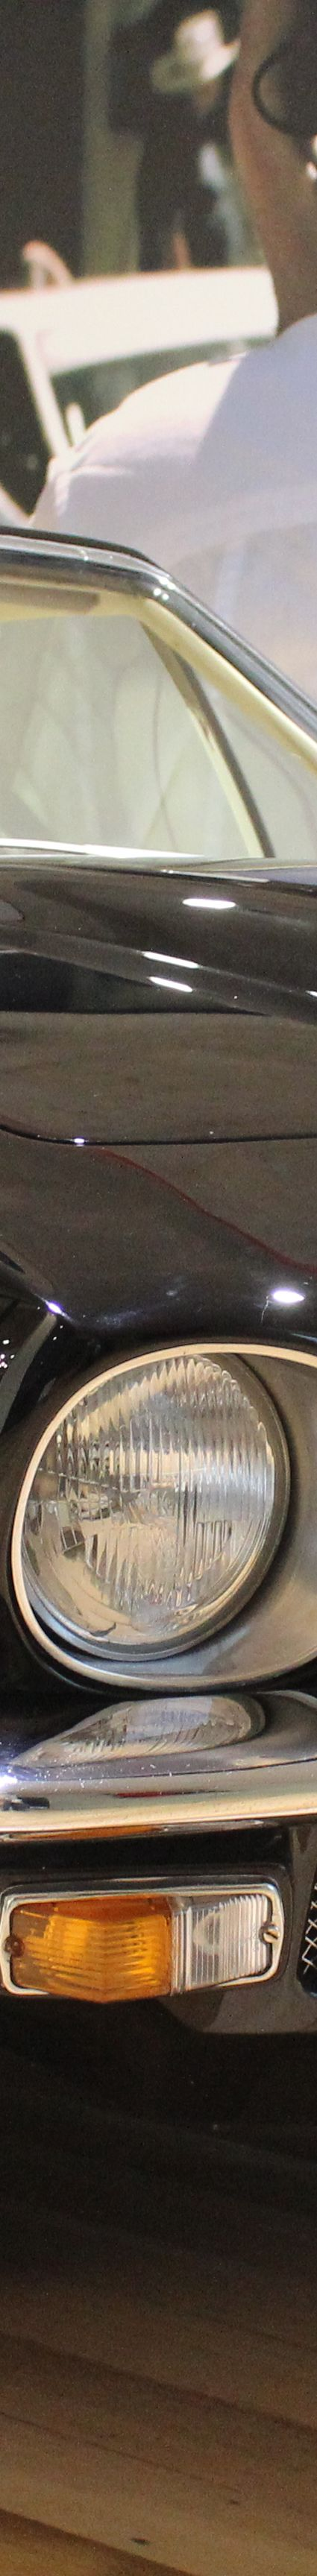 1973 Aston Martin DBS- sold in Australia